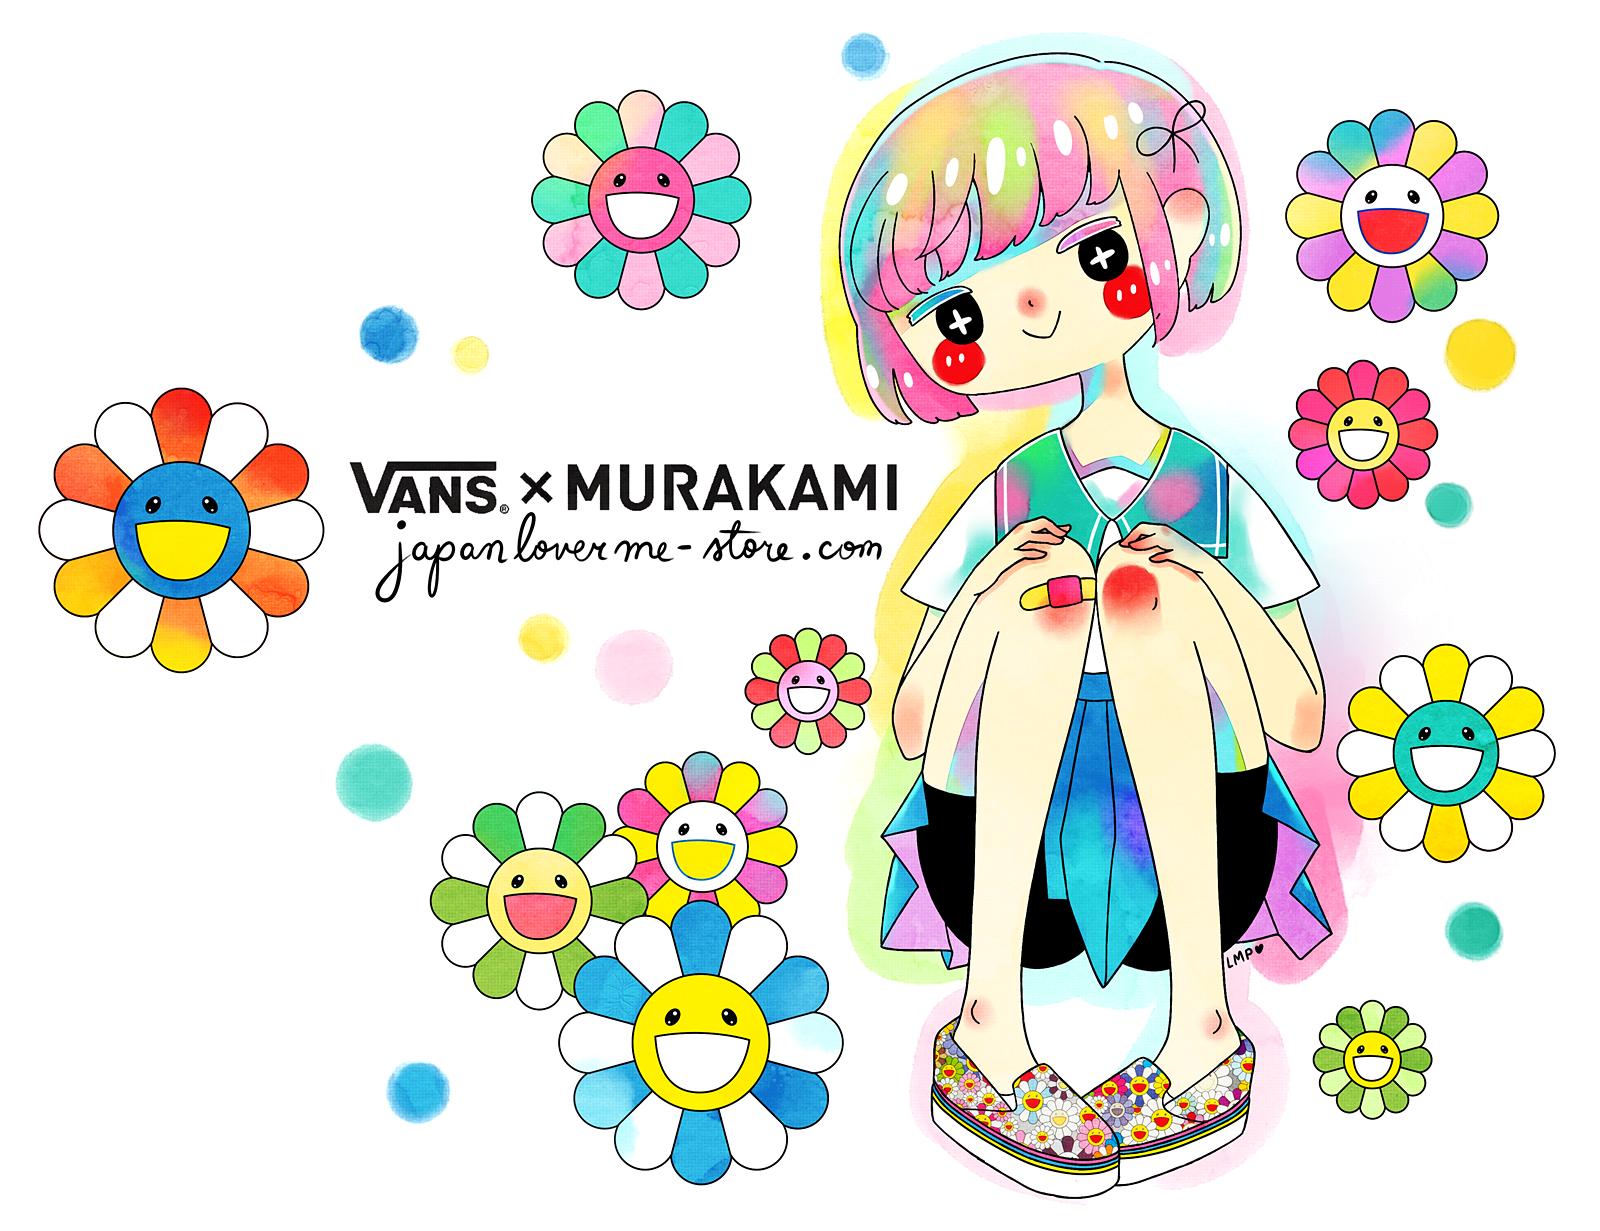 murakami vans illus - banner